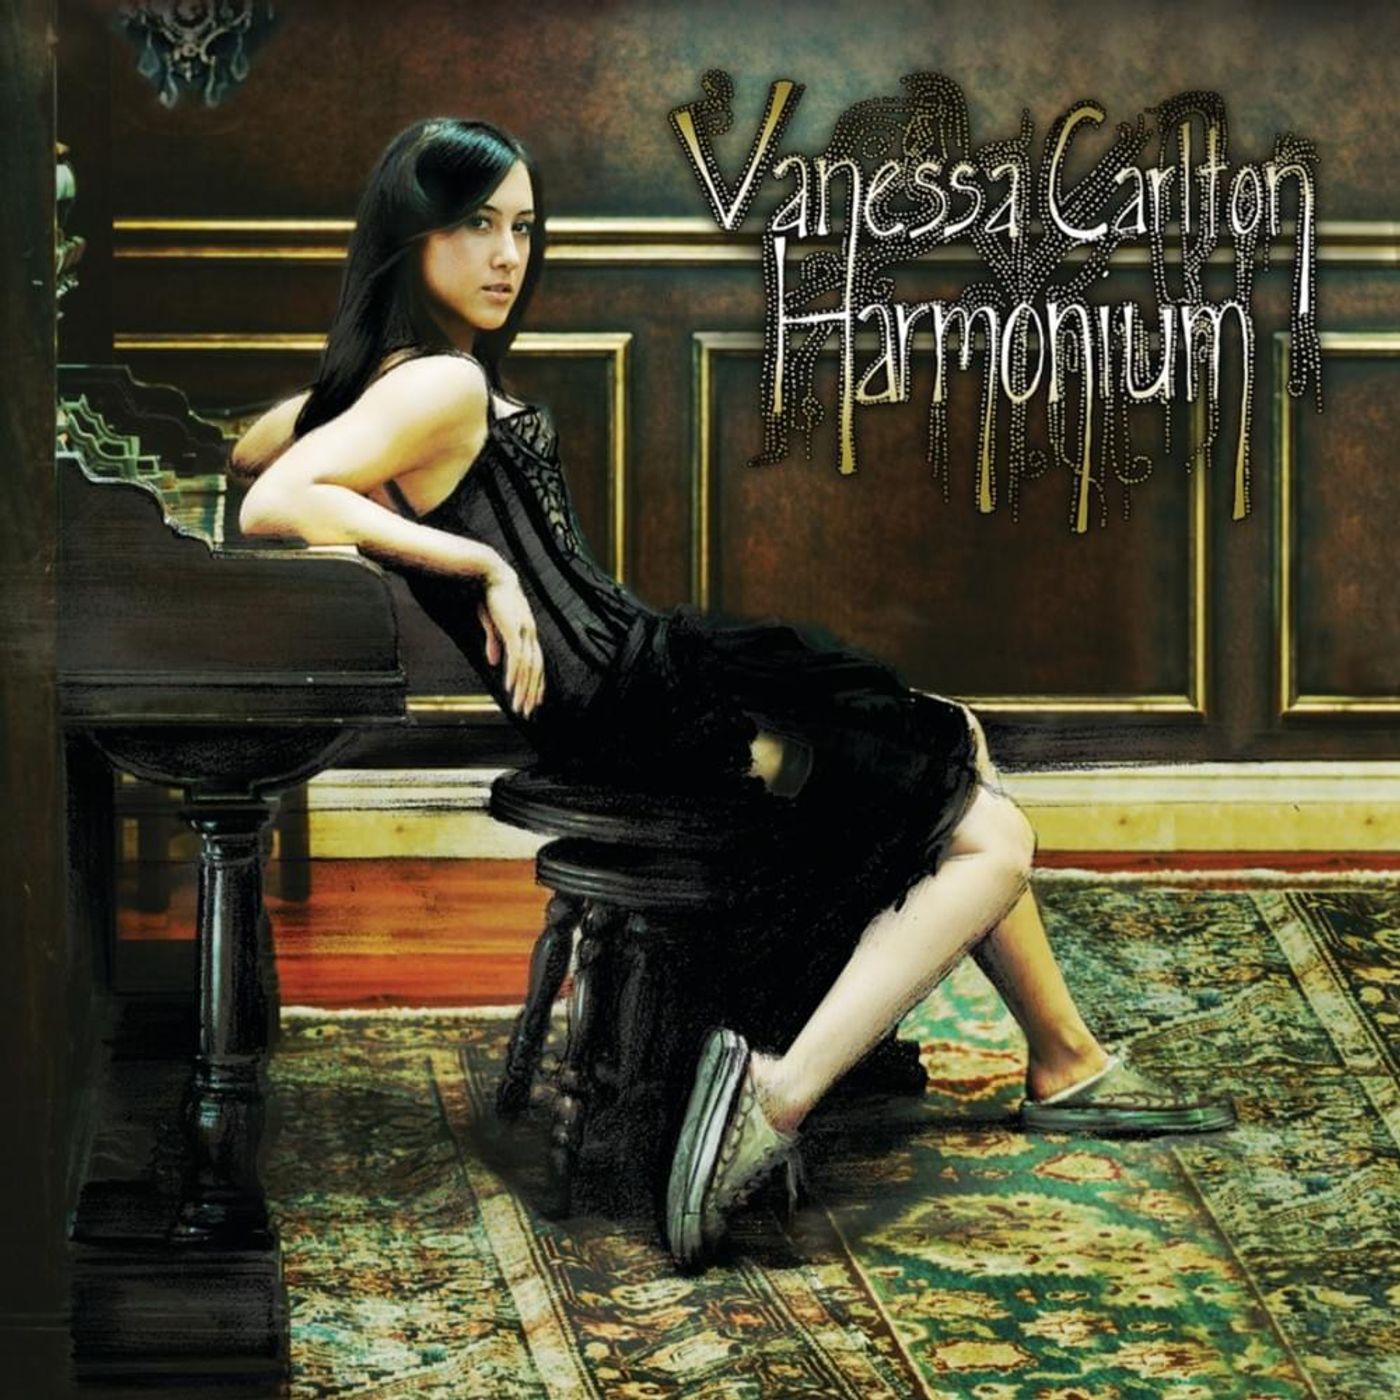 Harmonium: Vanessa Carlton with Kaley Roberts